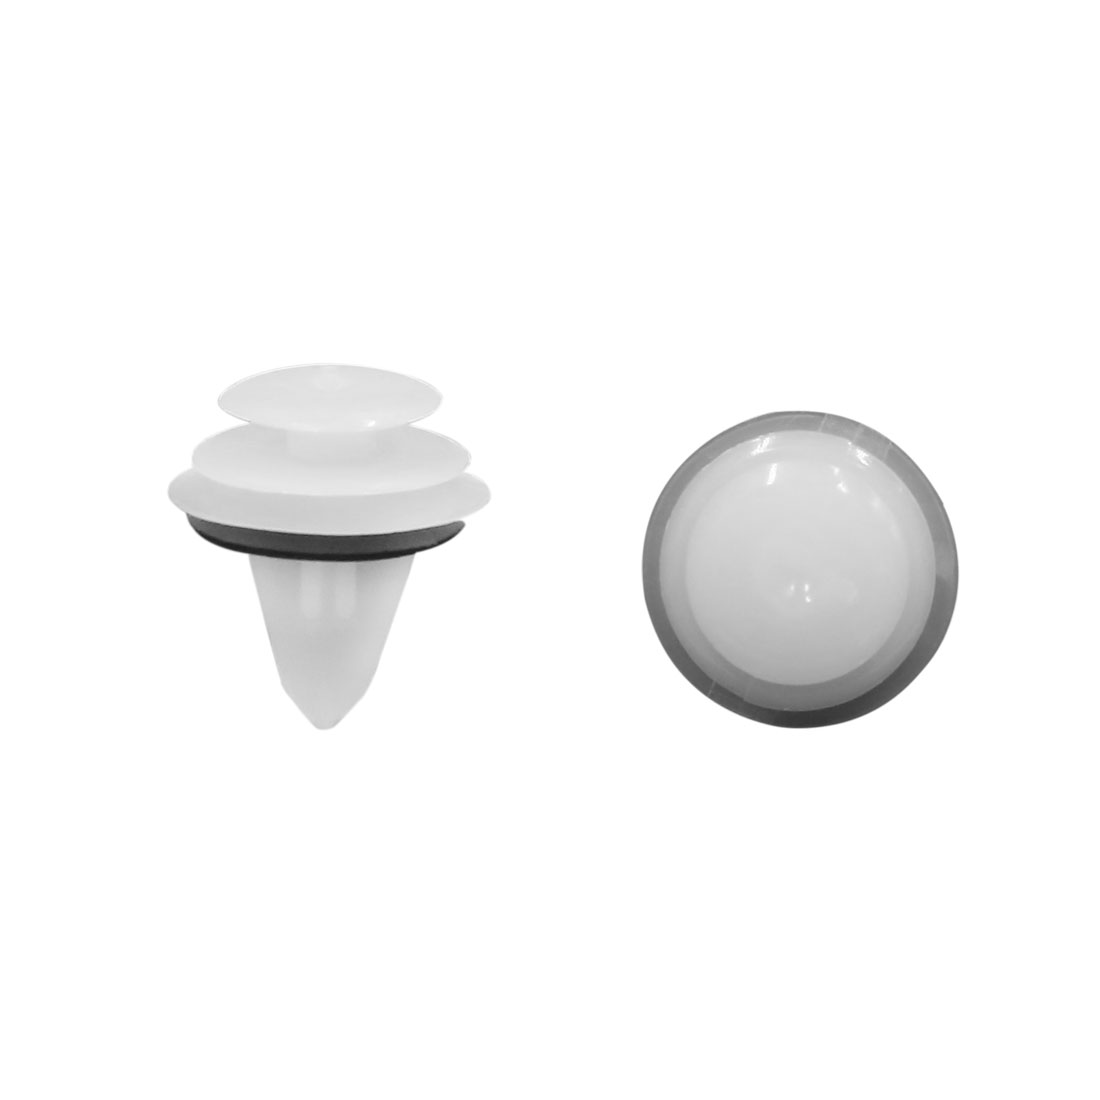 50 Pcs White Plastic Push in Type Rivets Fastener Buckle for Car Door bumper